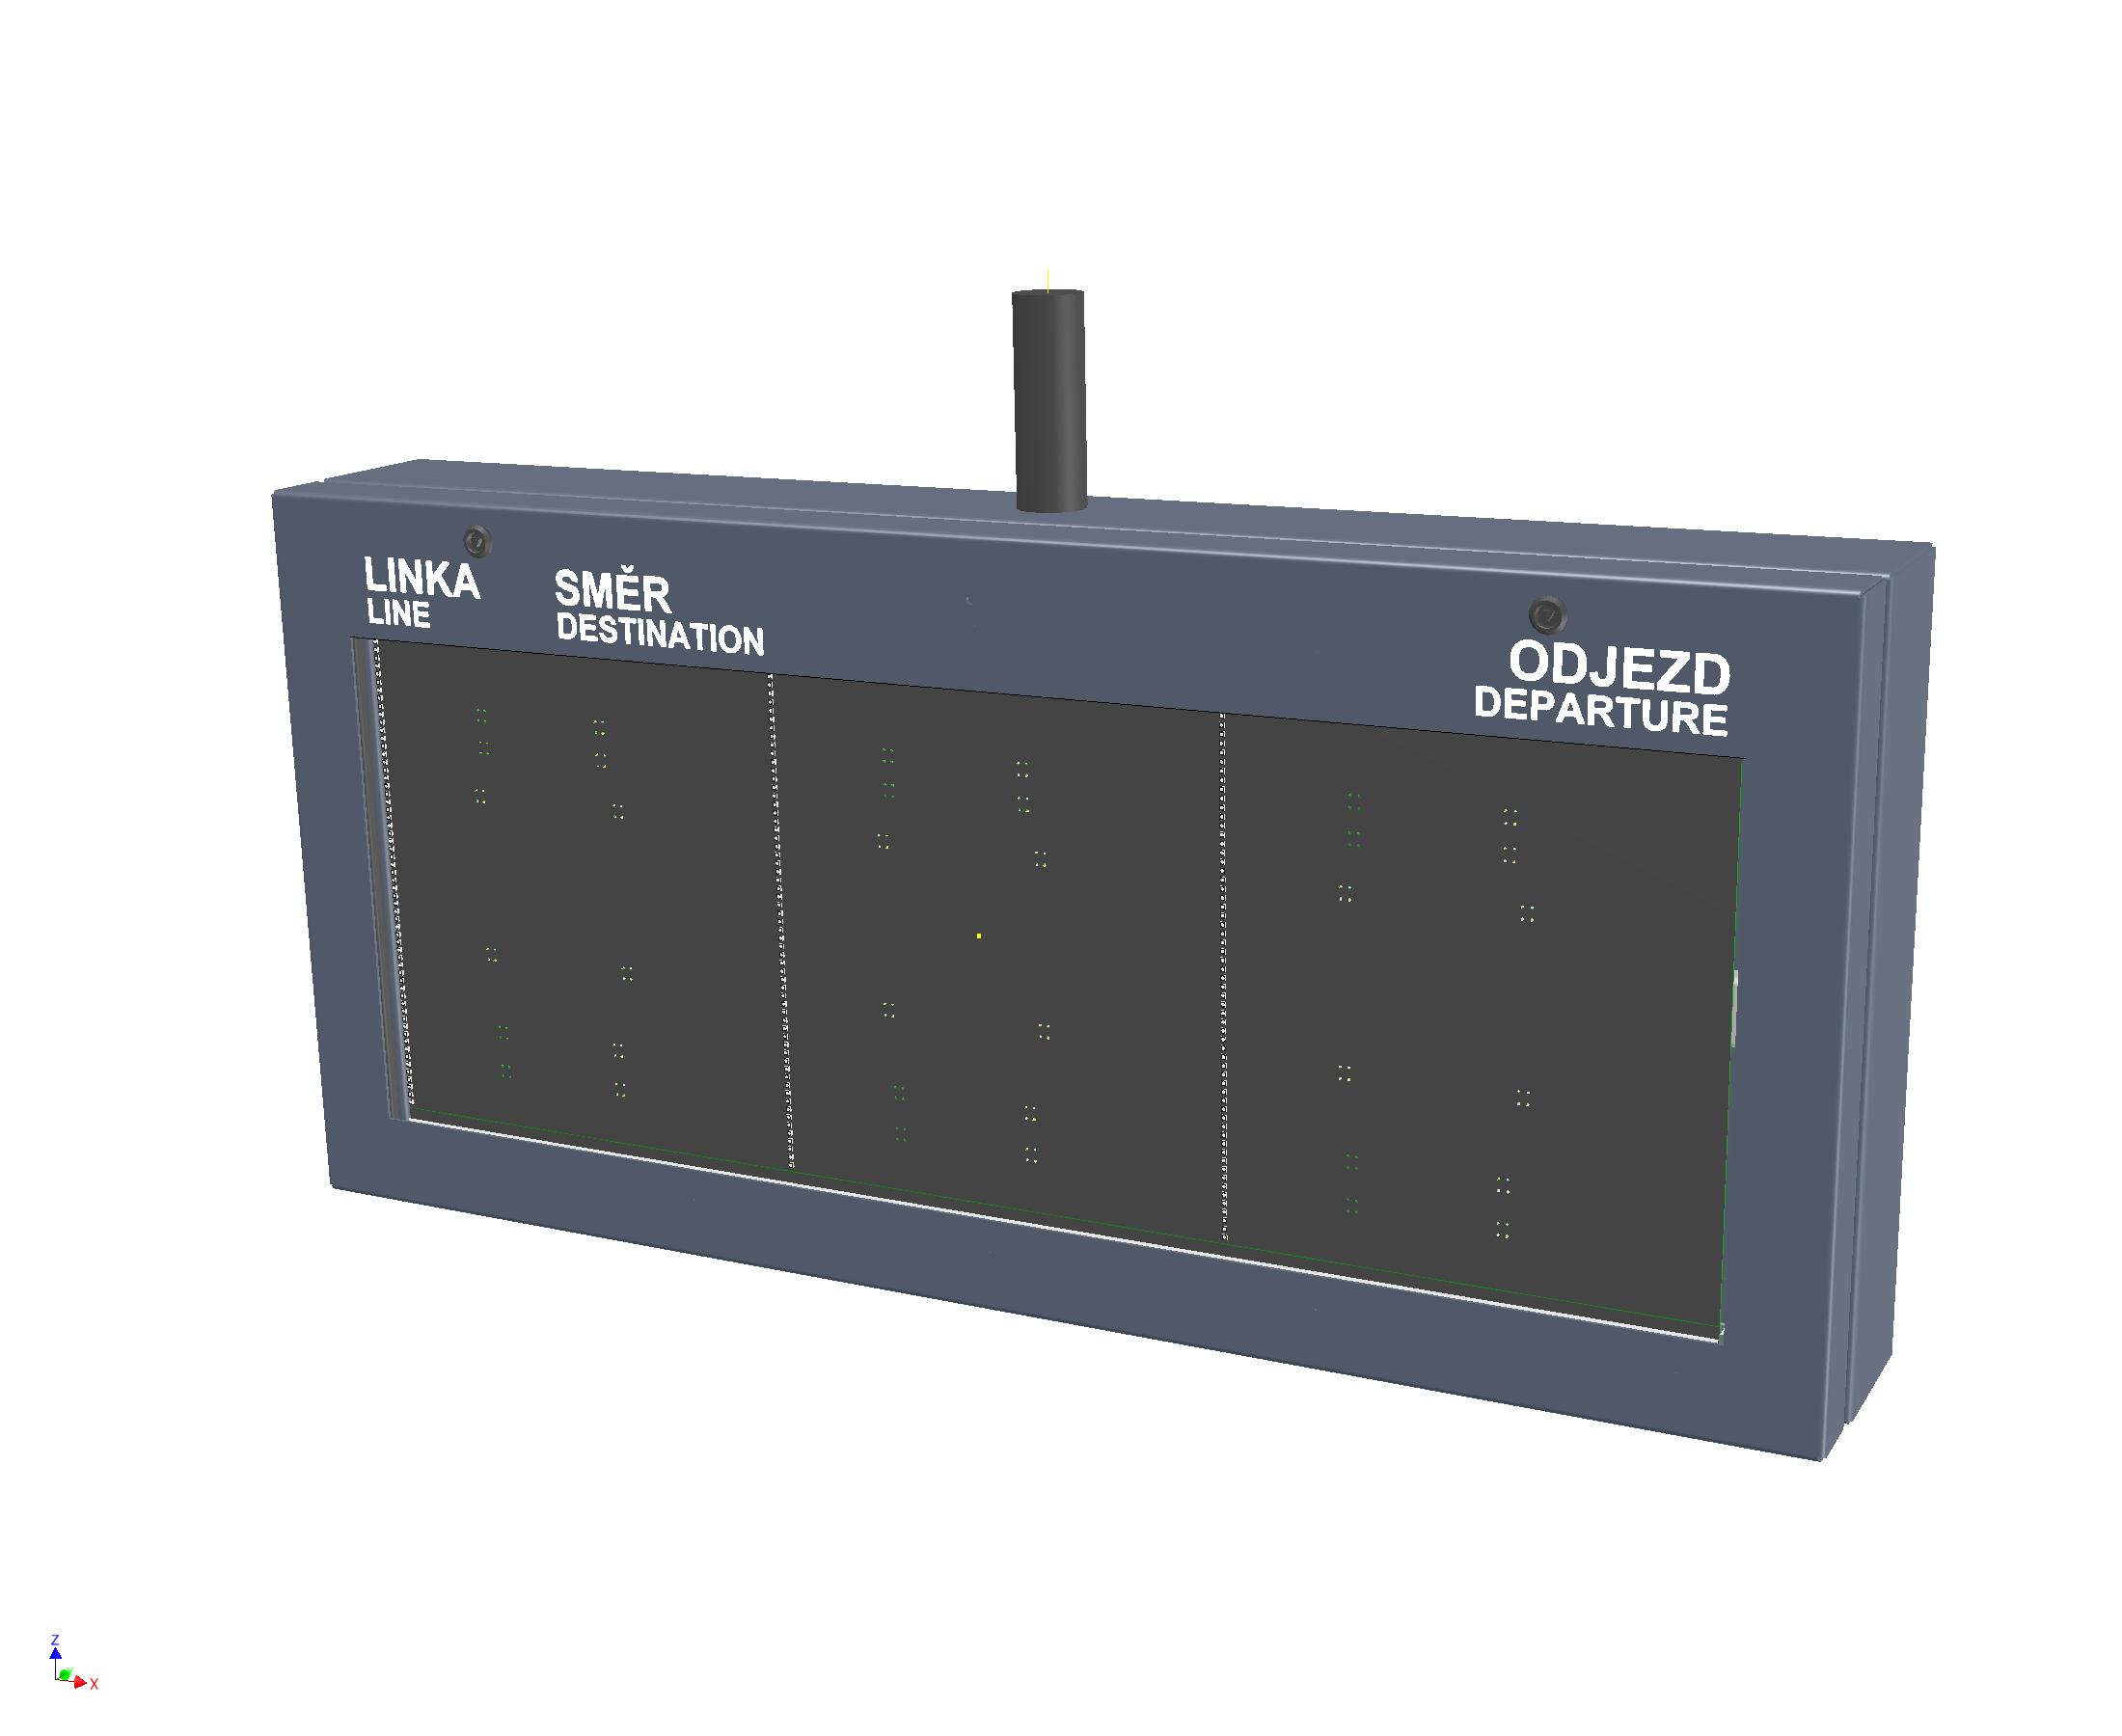 Koncept zastávkového LED panelu ELP 332